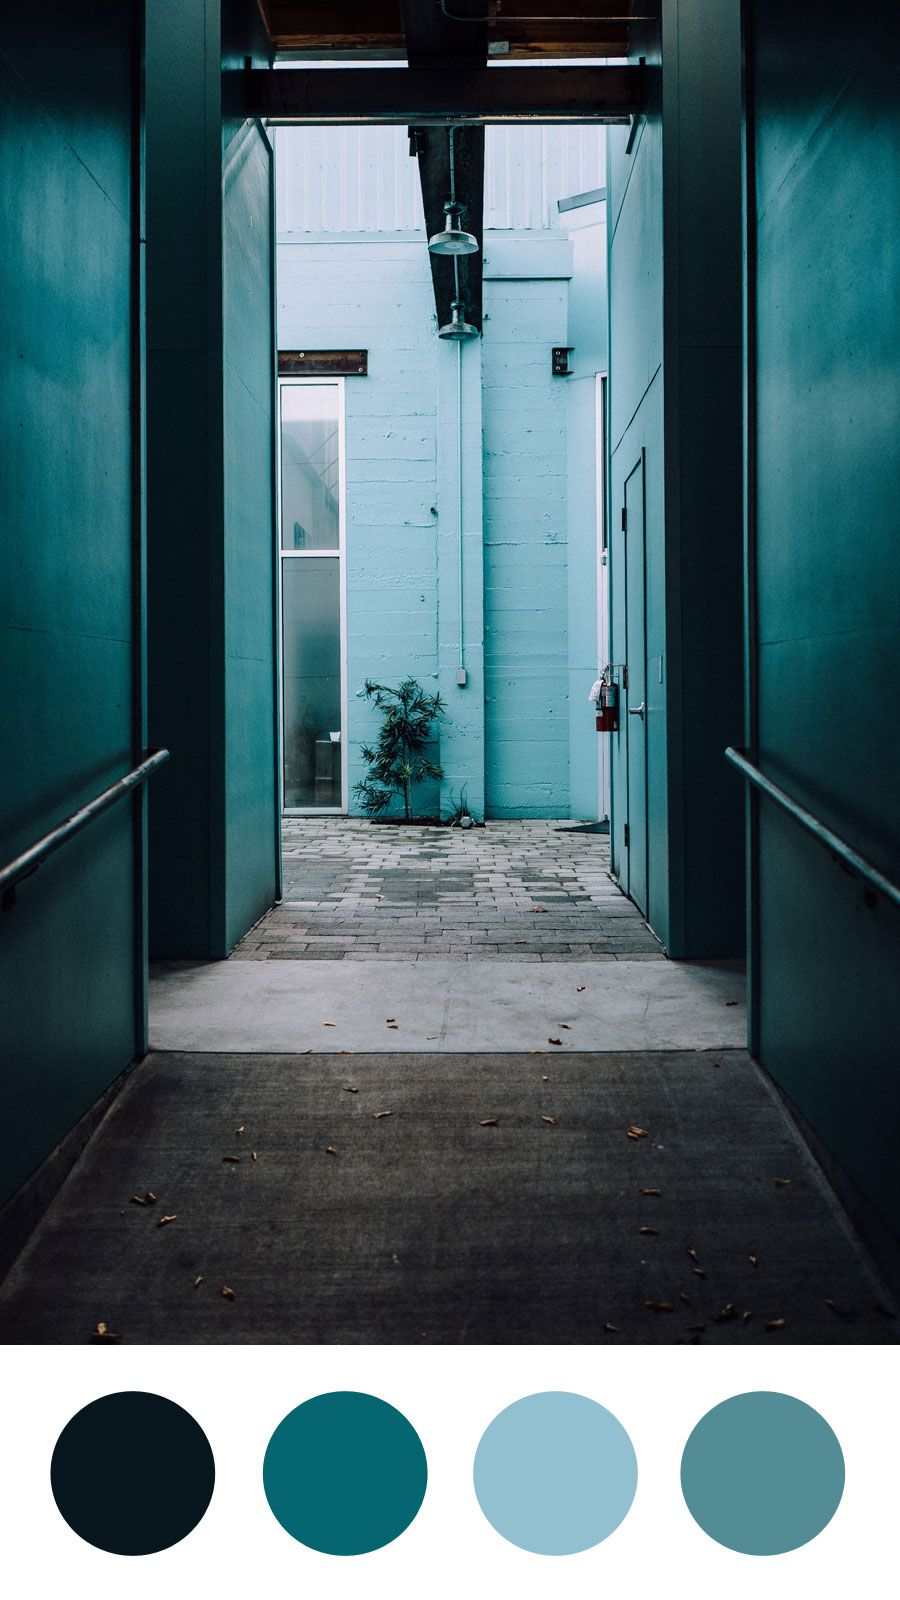 Cool Corridors Color Palette Emma Englishby Fossil Grey Cornflower Blue And Bondi